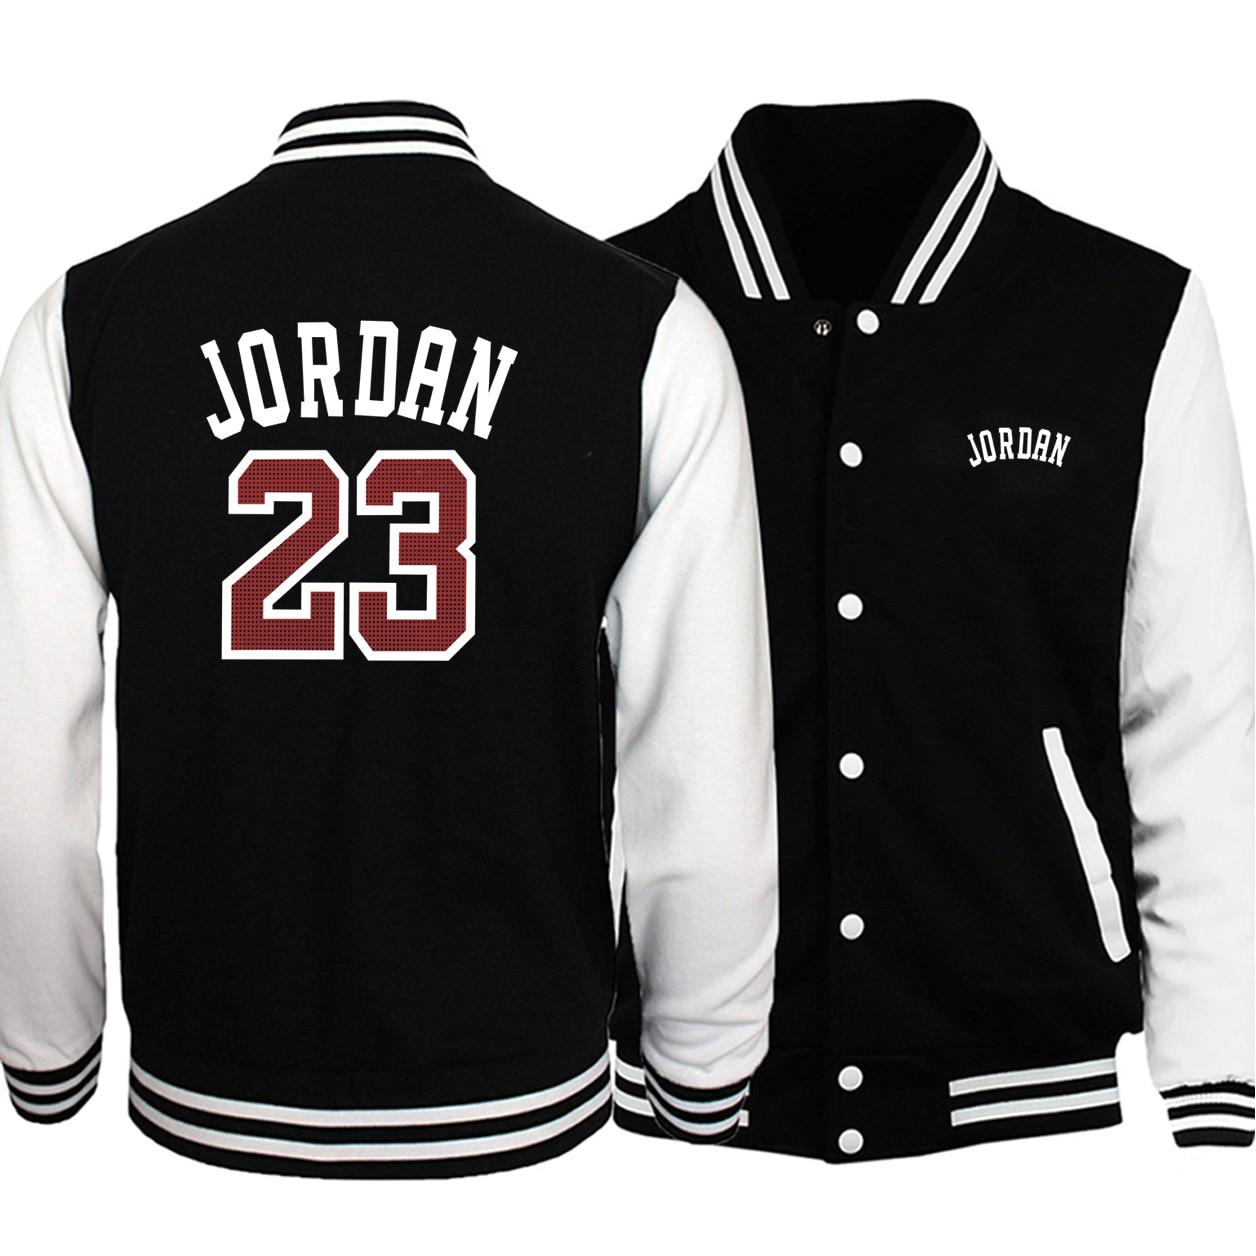 2019 Hot Sale Men Baseball Uniform Sportswear Autumn Bomber Jacket Jordan 23 Print Tracksuit Hip Hop Men Coats Casual Streetwear